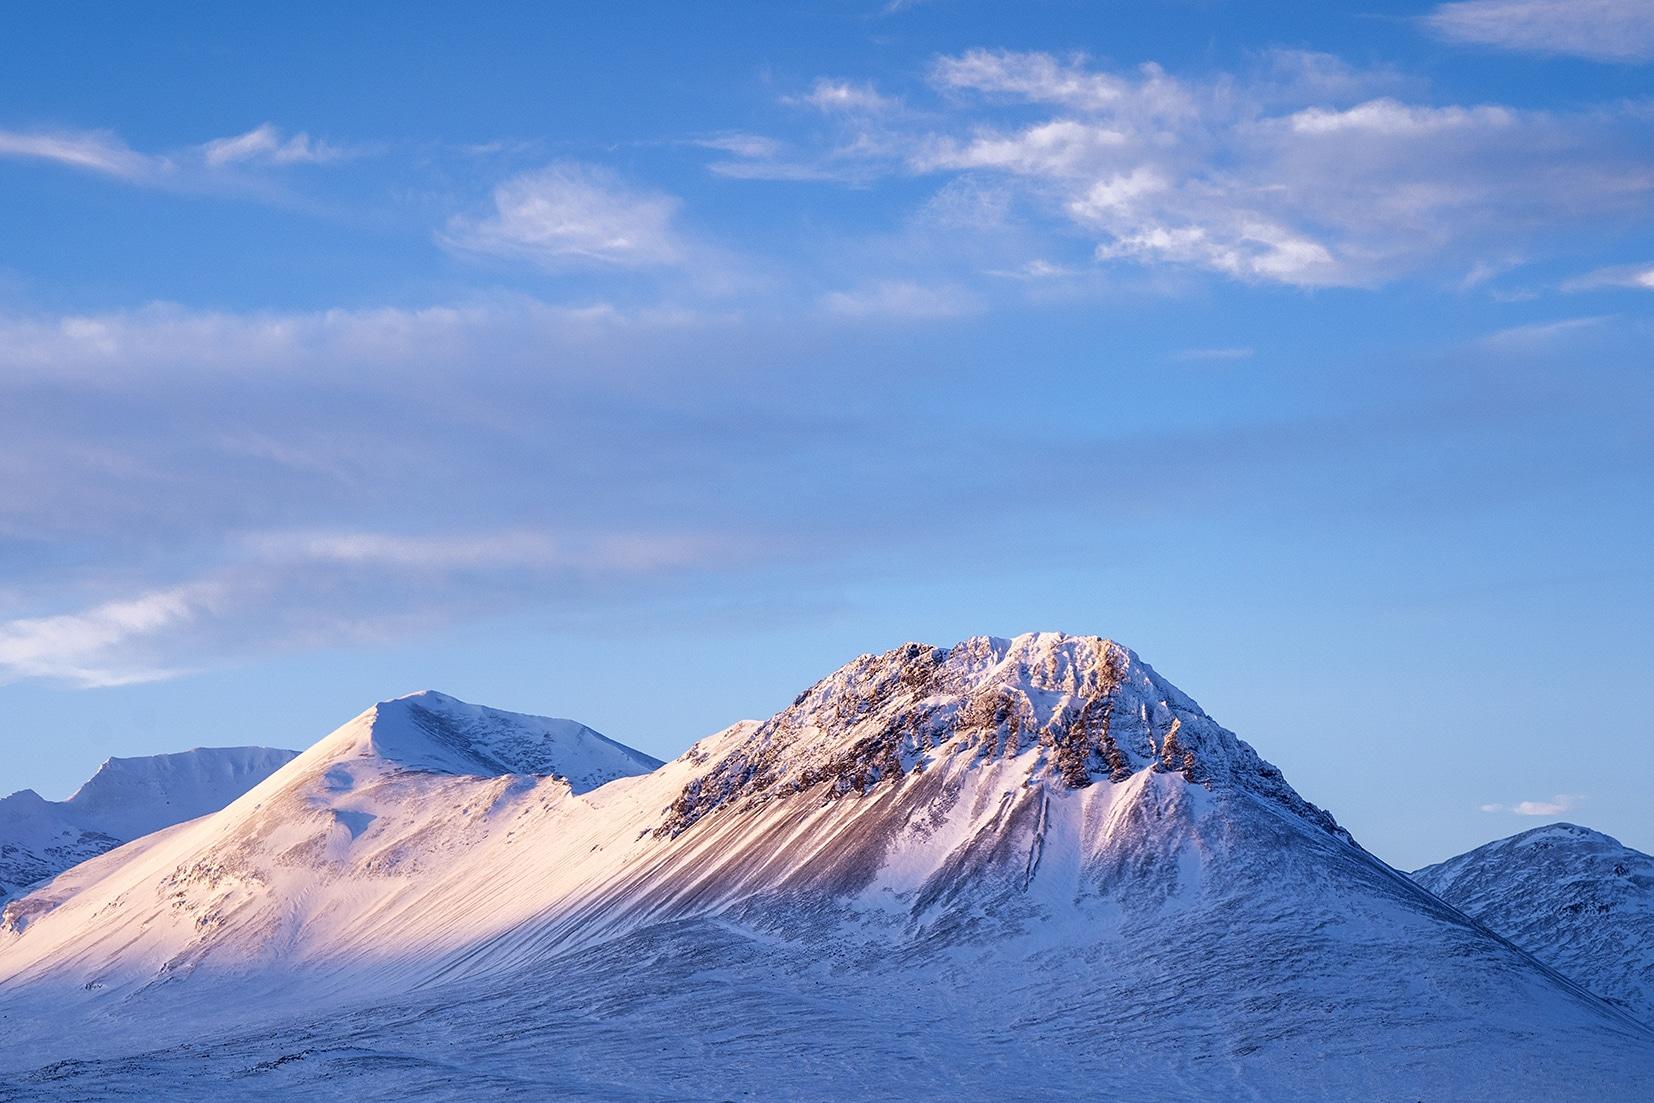 Islande du Nord montagnes lever de soleil ciel bleu